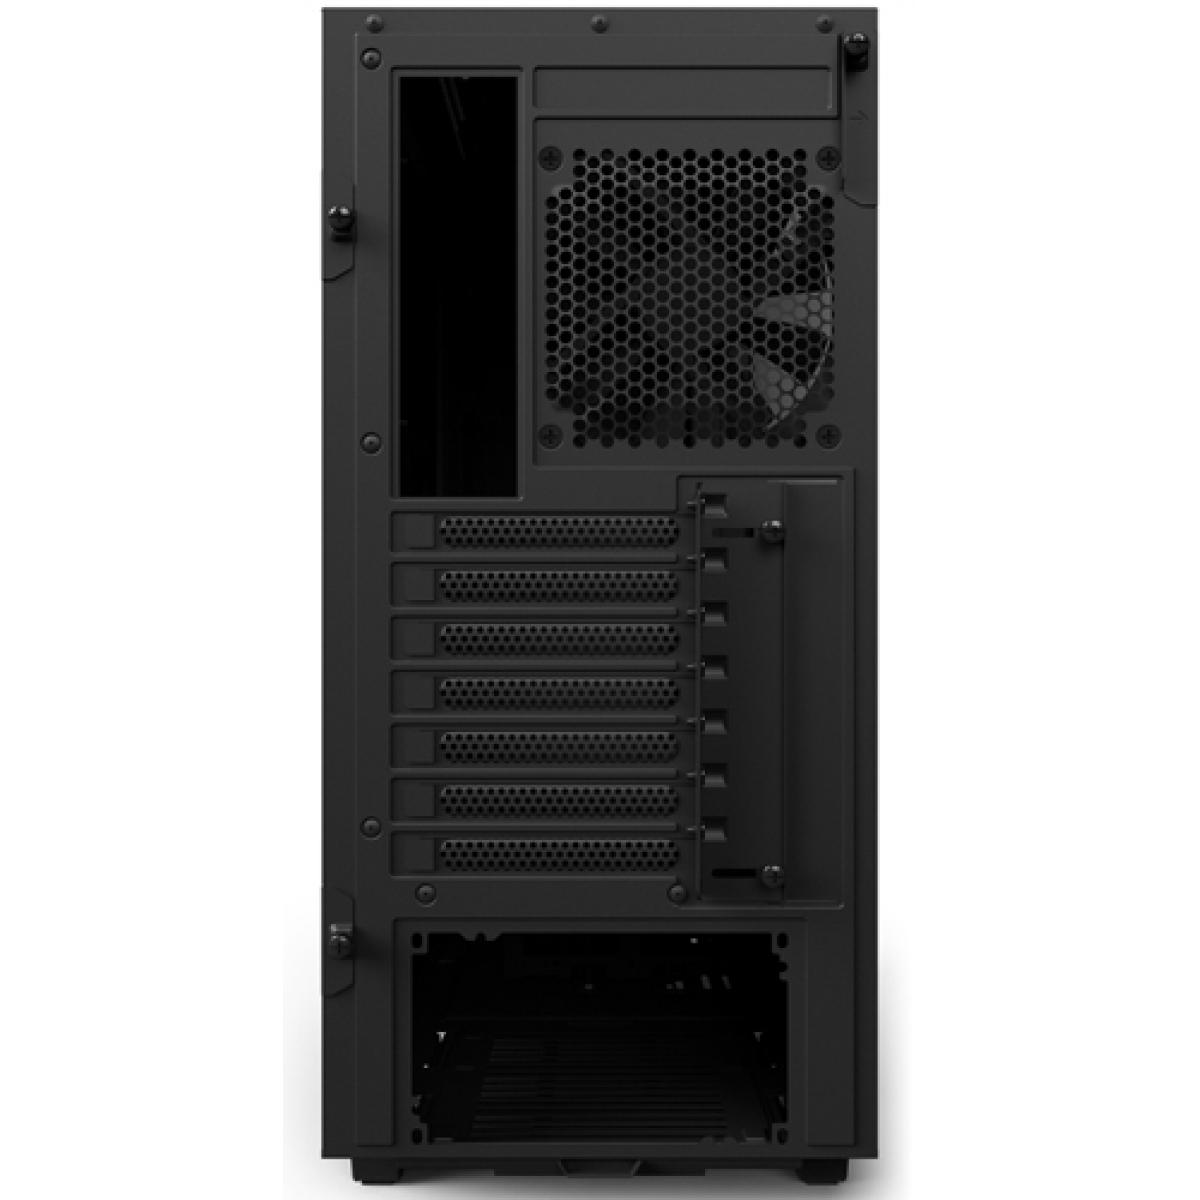 Gabinete Gamer NZXT H500, Mid Tower, Com 2 Fans, Vidro Temperado, Black, Sem Fonte, CA-H500B-B1